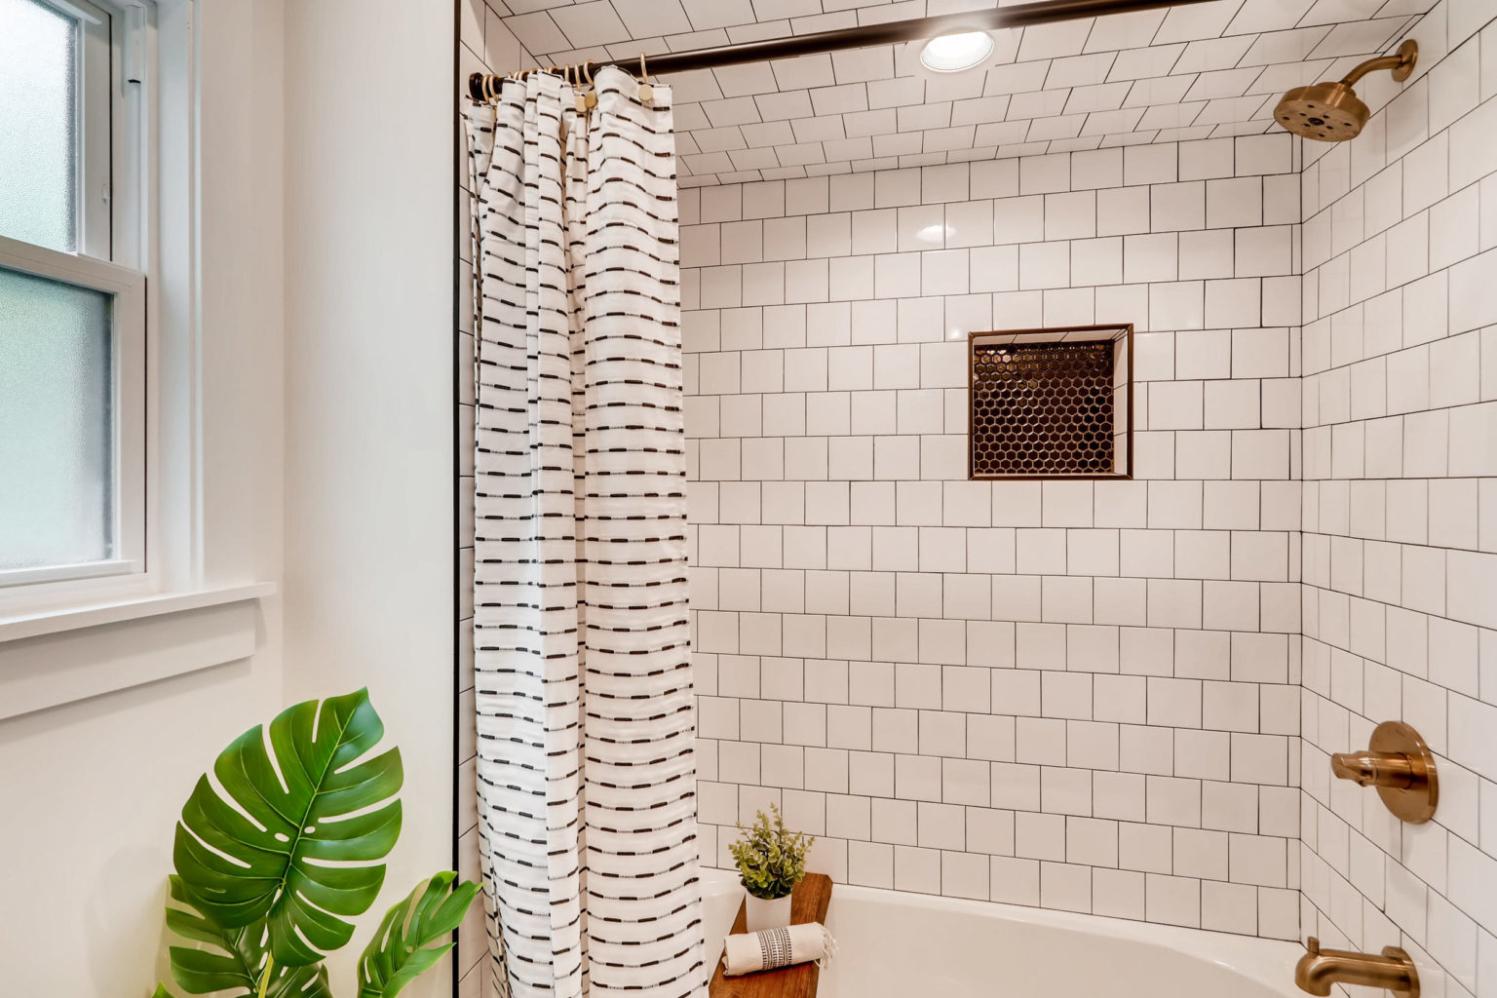 621+67th+st+downers+grove+il Print 022 14 2nd+floor+bathroom 3600x2400 300dpi